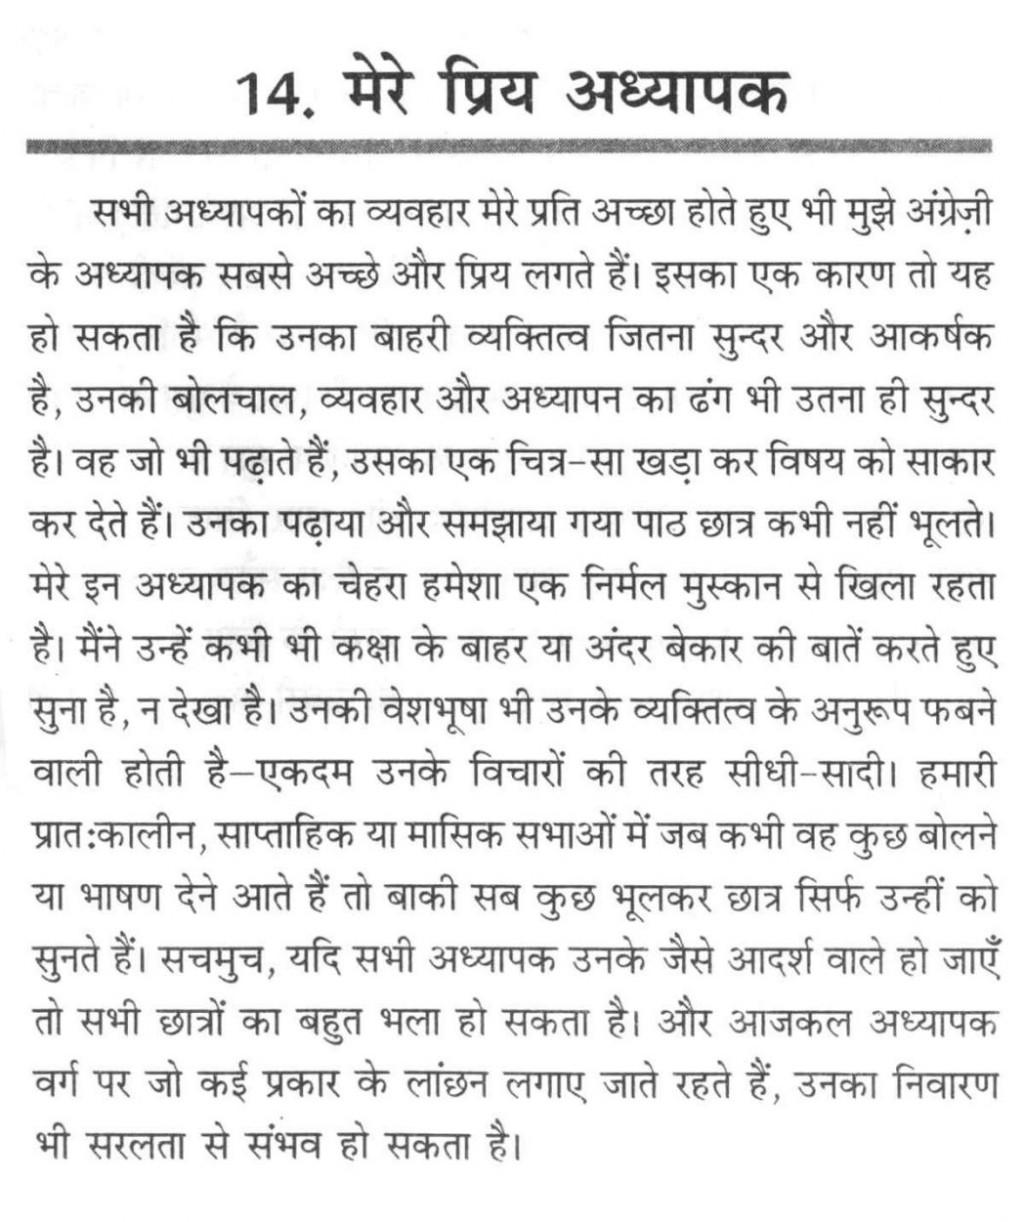 007 Qualities Of Good Friend Essay Buying Student Pdf In Telugu Punjabi Successful English Traits Leader Words Hindi Urdu 1048x1251 Exceptional A Short Large